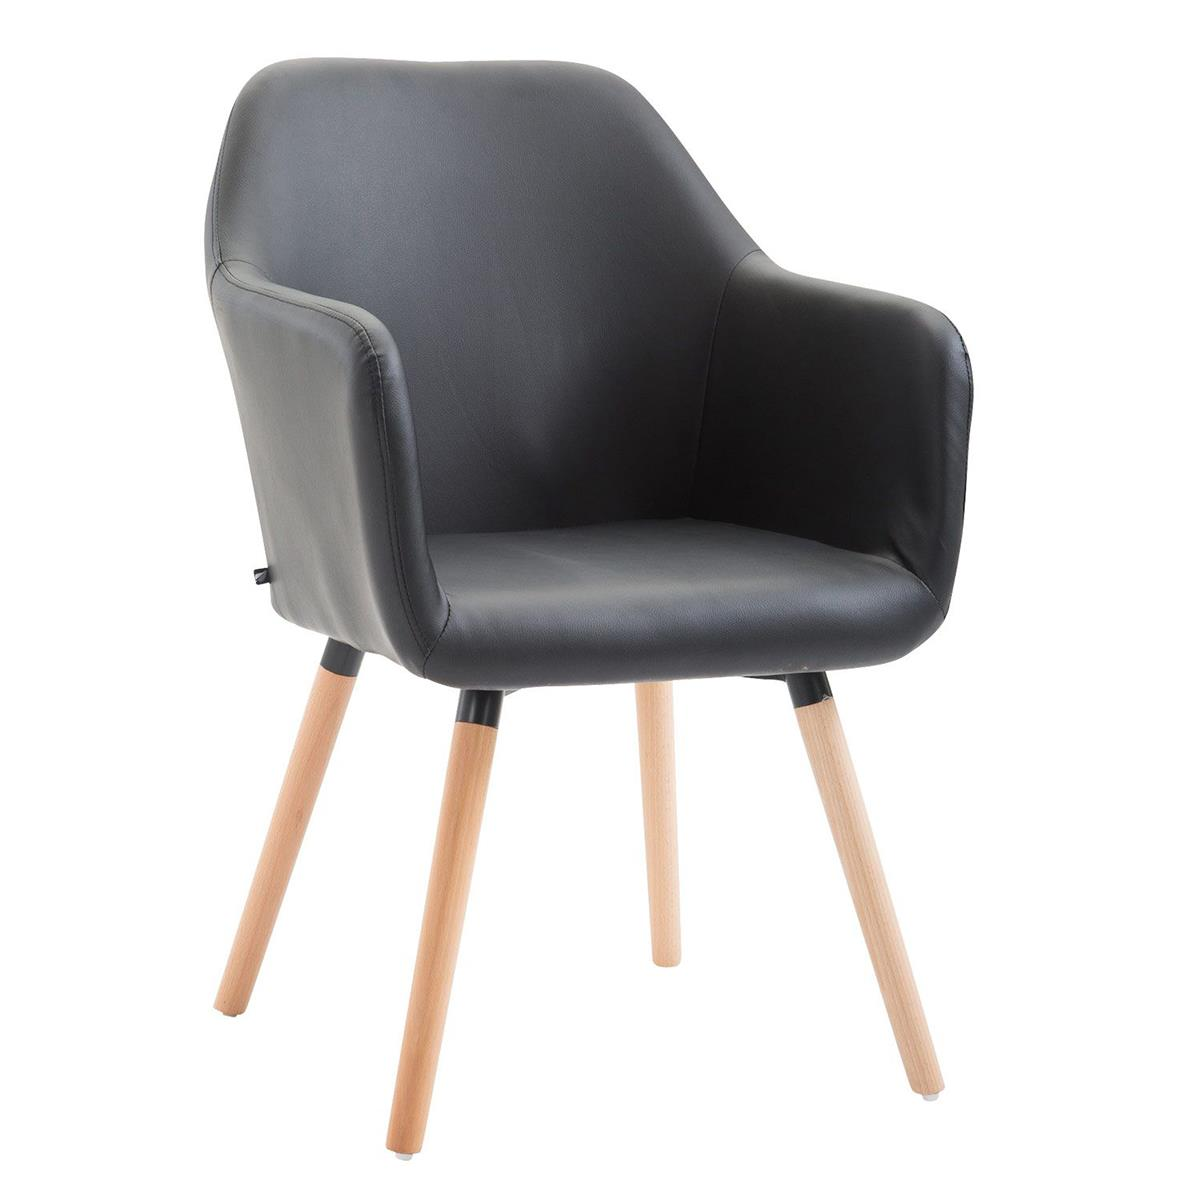 Sedia per sala d 39 attesa niebla pelle design sofisticato for Sedia per sala d attesa